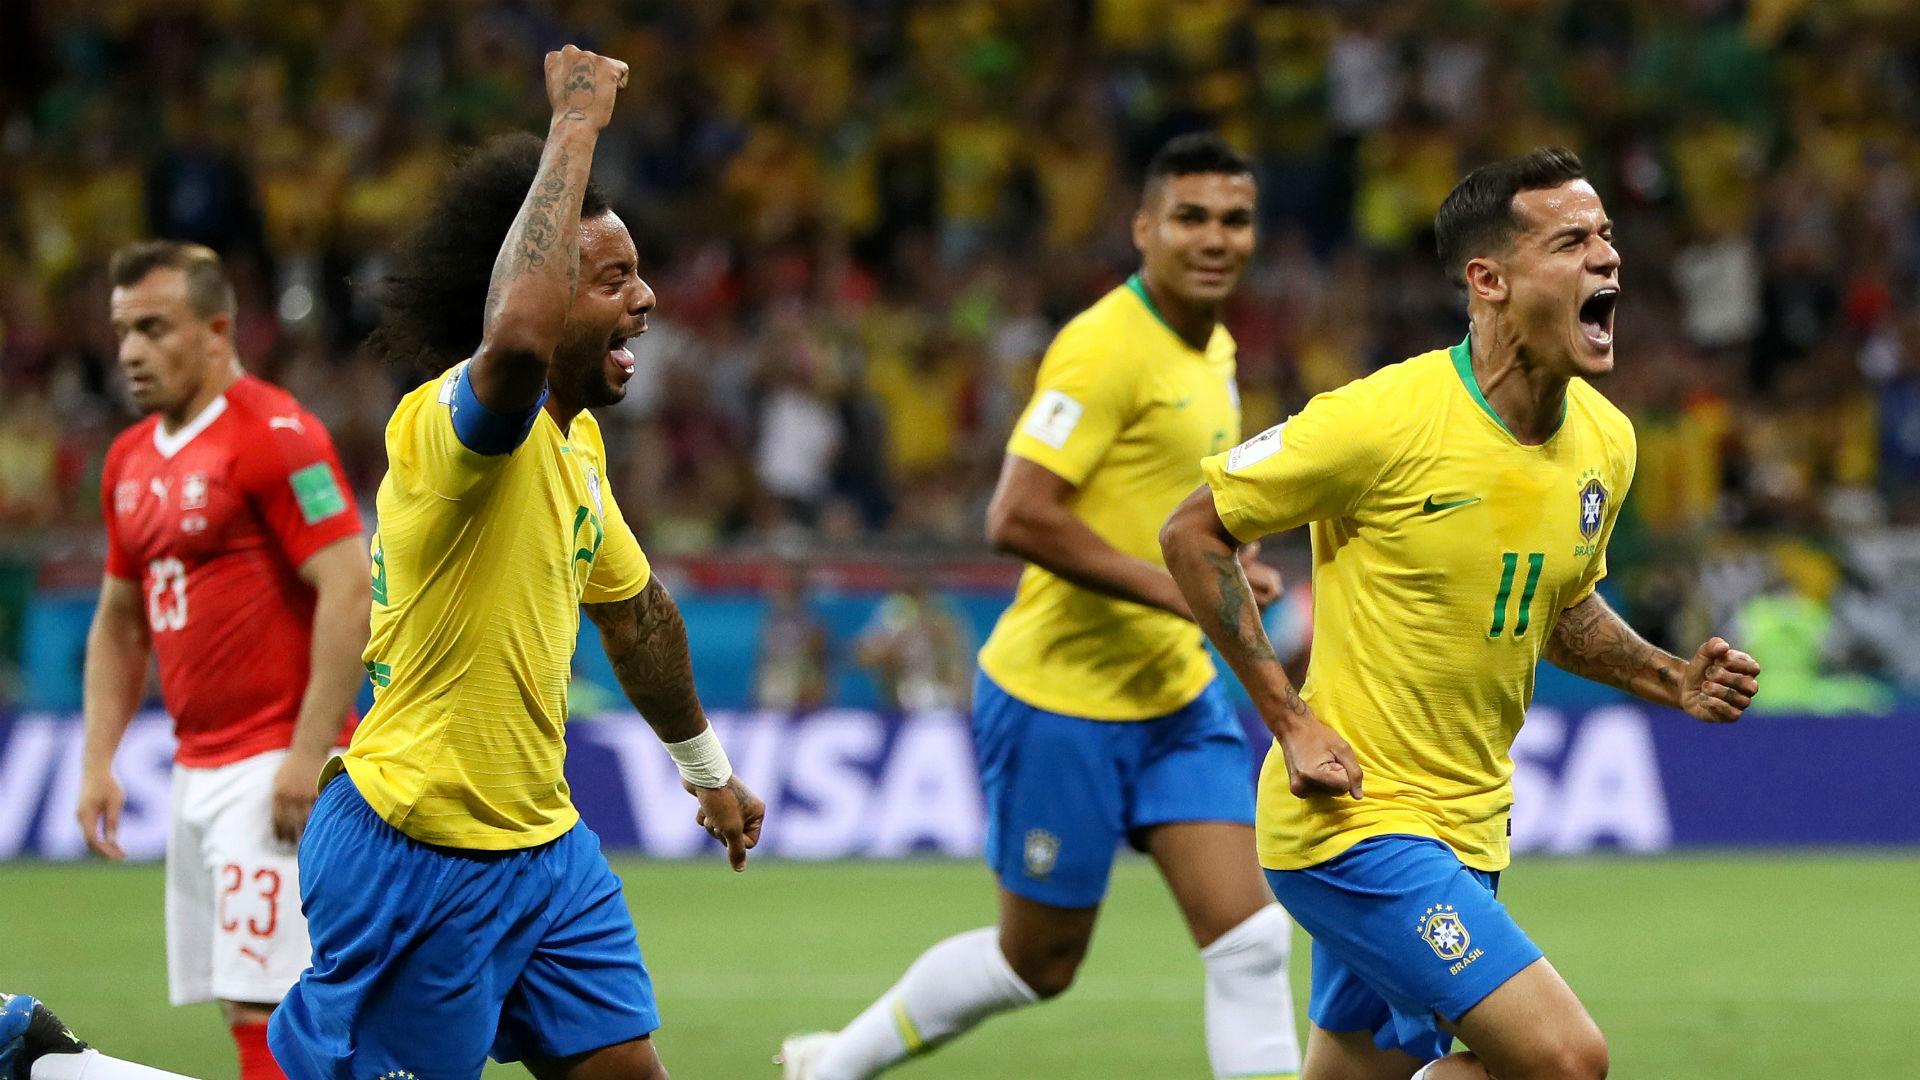 Philippe Coutinho Brazil Switzerland World Cup 2018